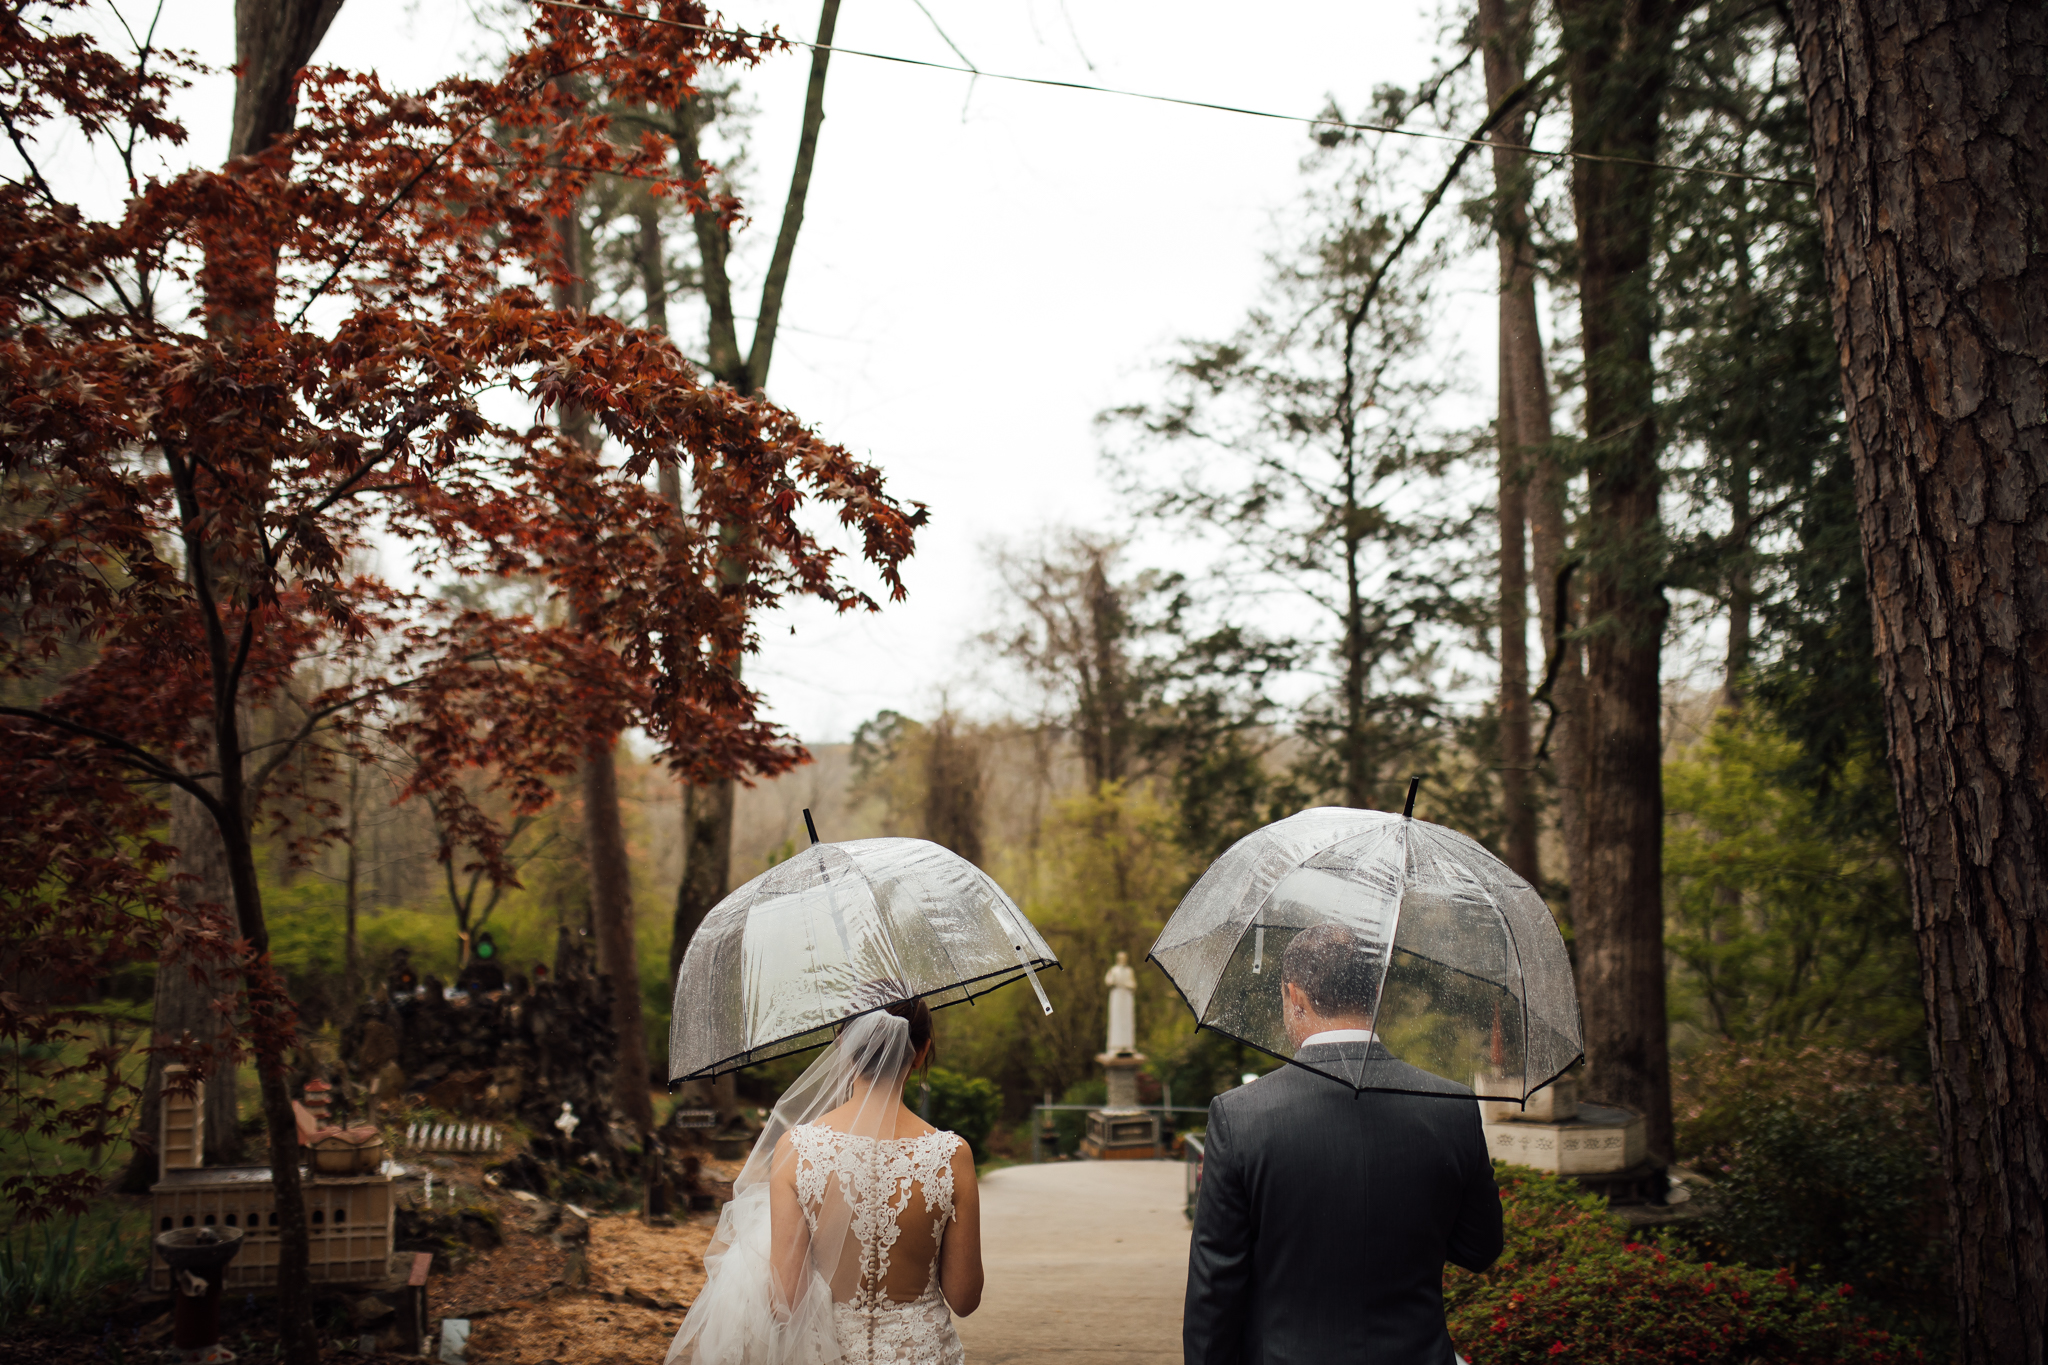 birmingham-al-wedding-photographer-the-warmth-around-you (6 of 13).jpg